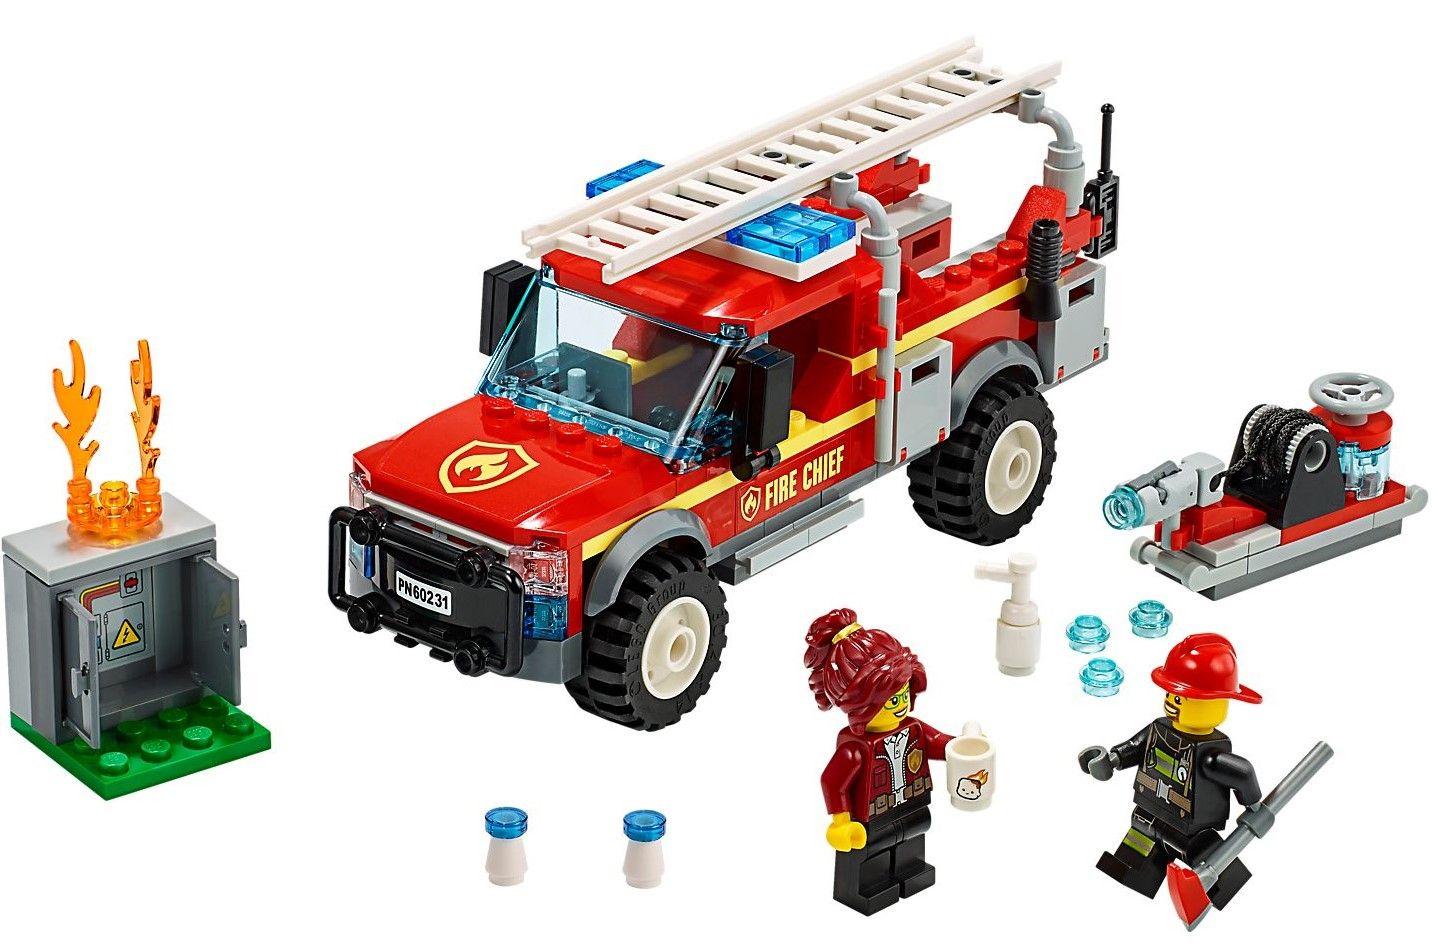 Конструктор Lego City - Fire Chief Response Truck (60231) - 4